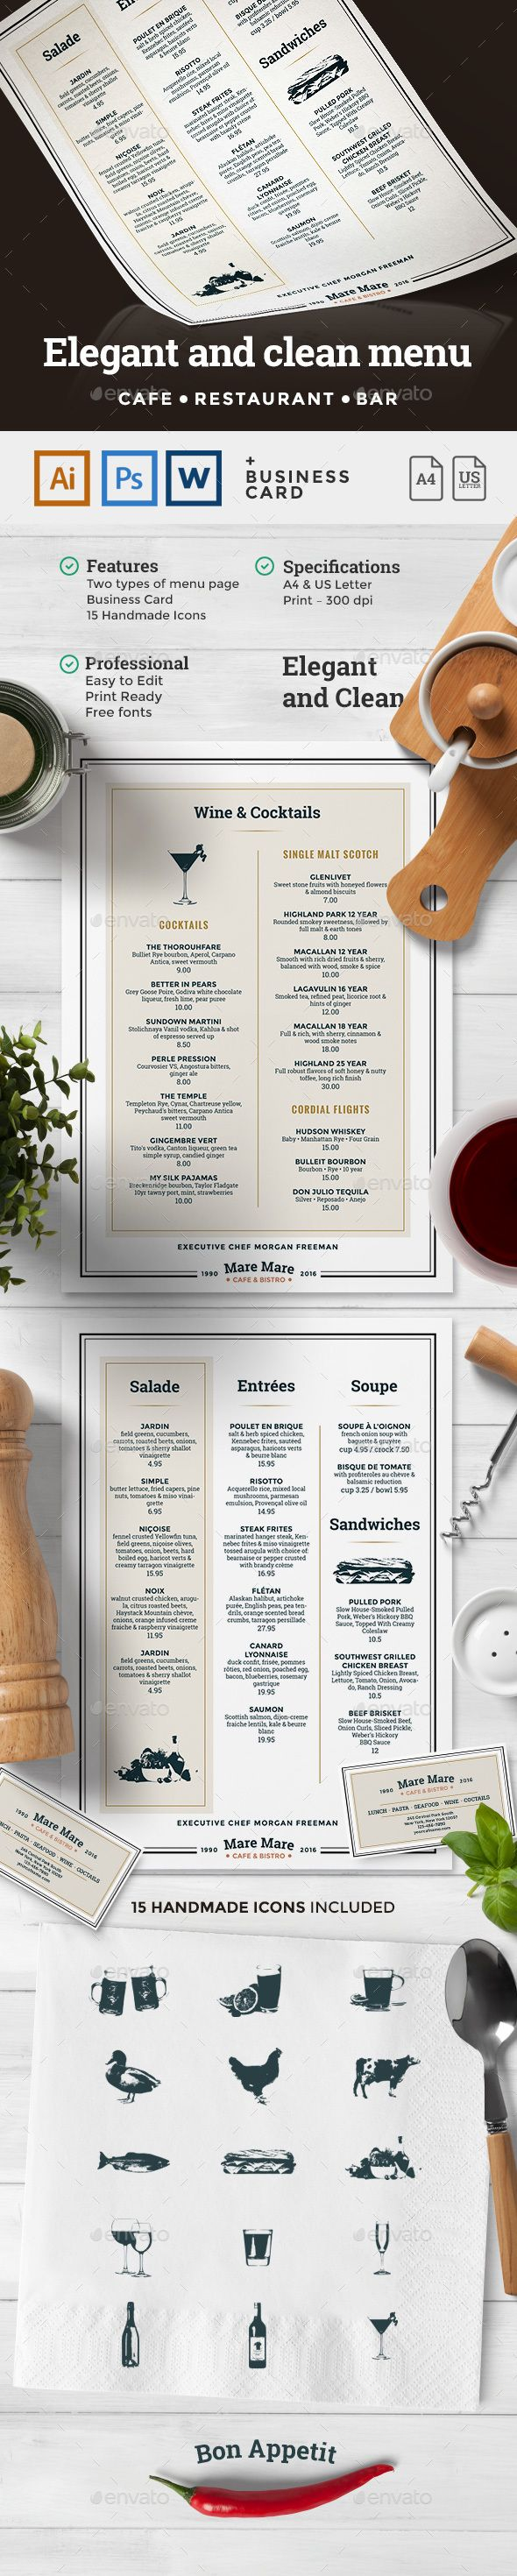 Menu Template | Pinterest | Menu templates, Menu and Print templates